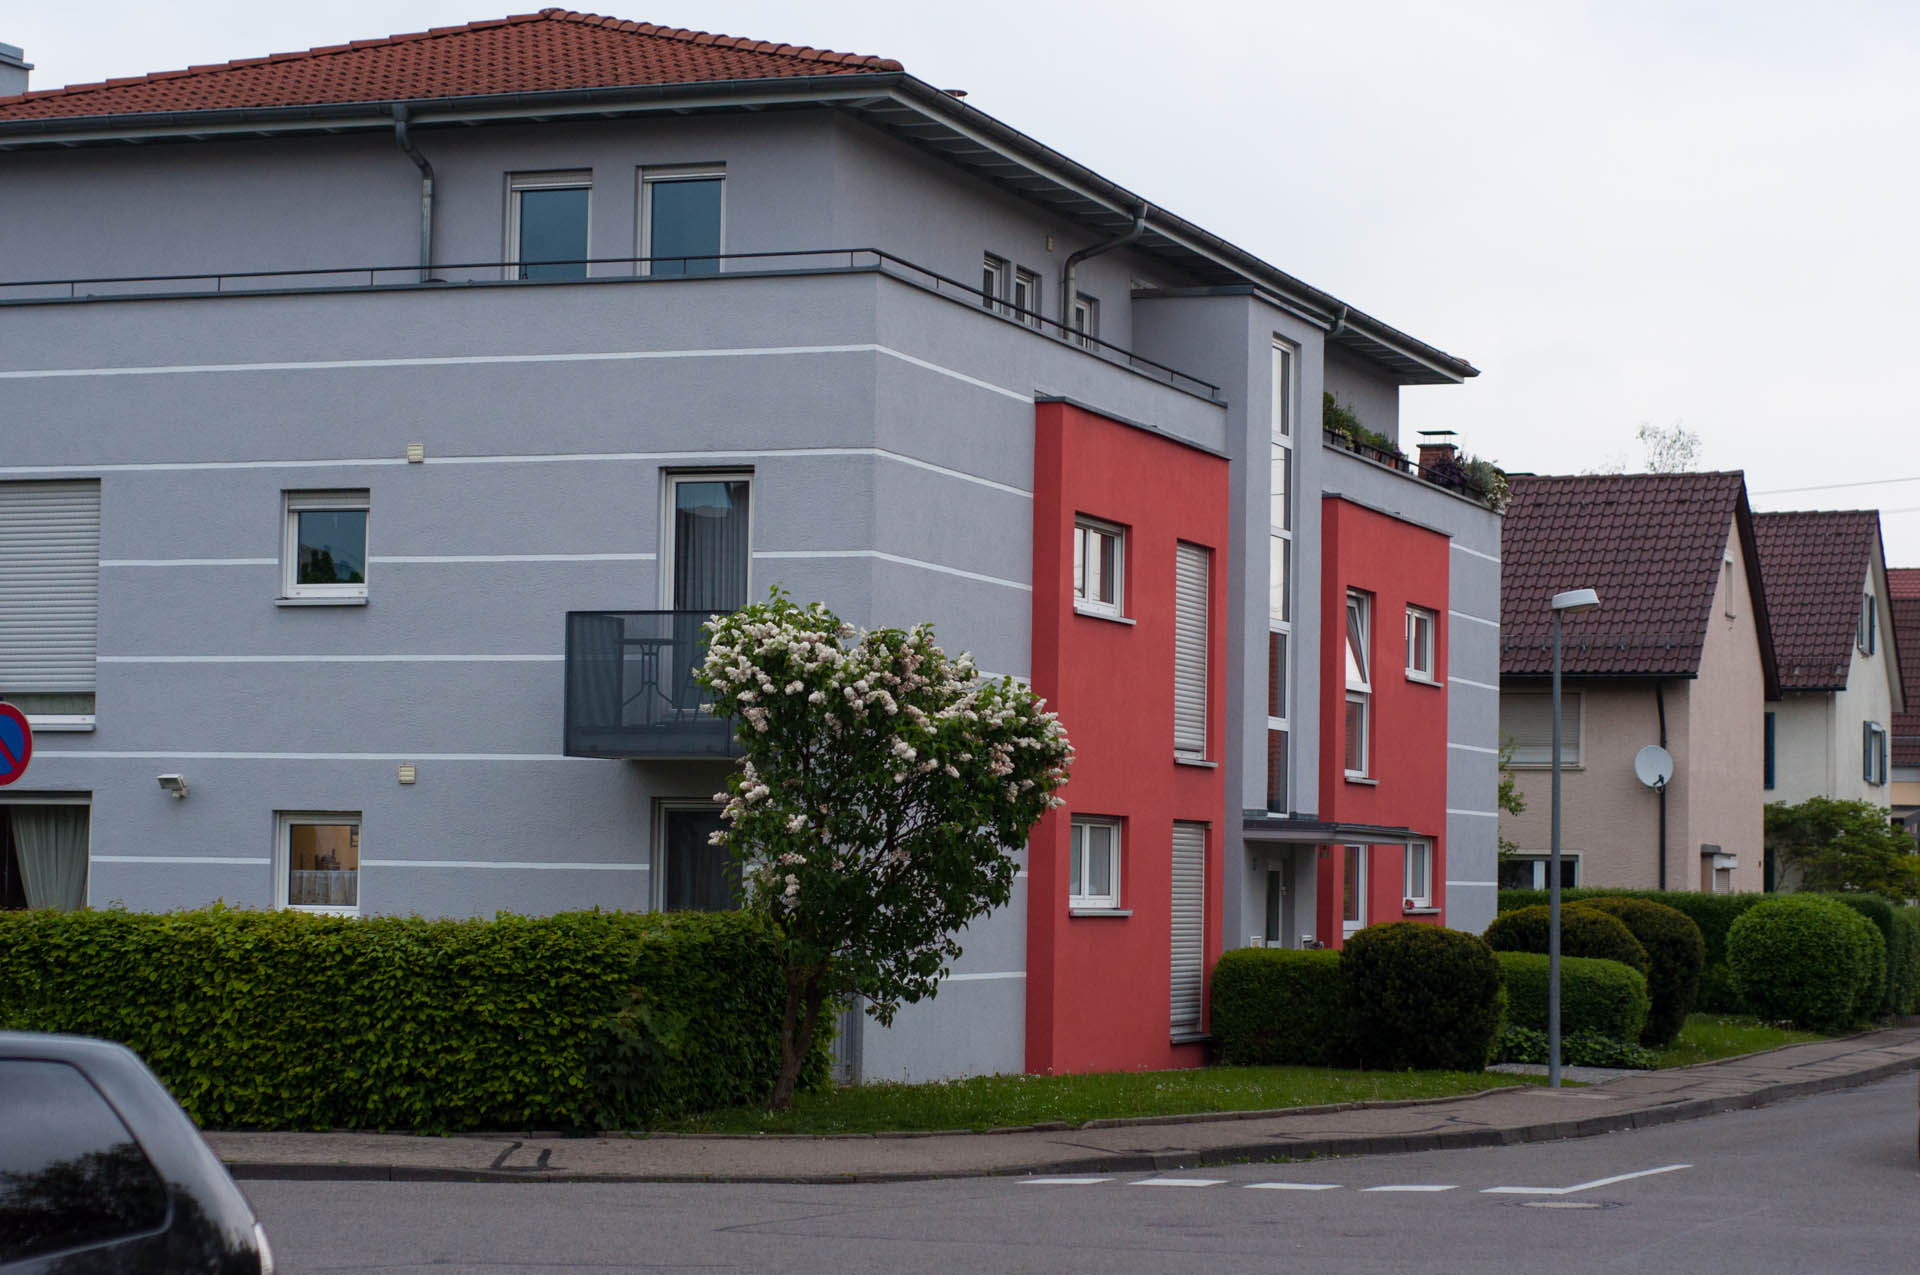 RavensburgJazz-5533